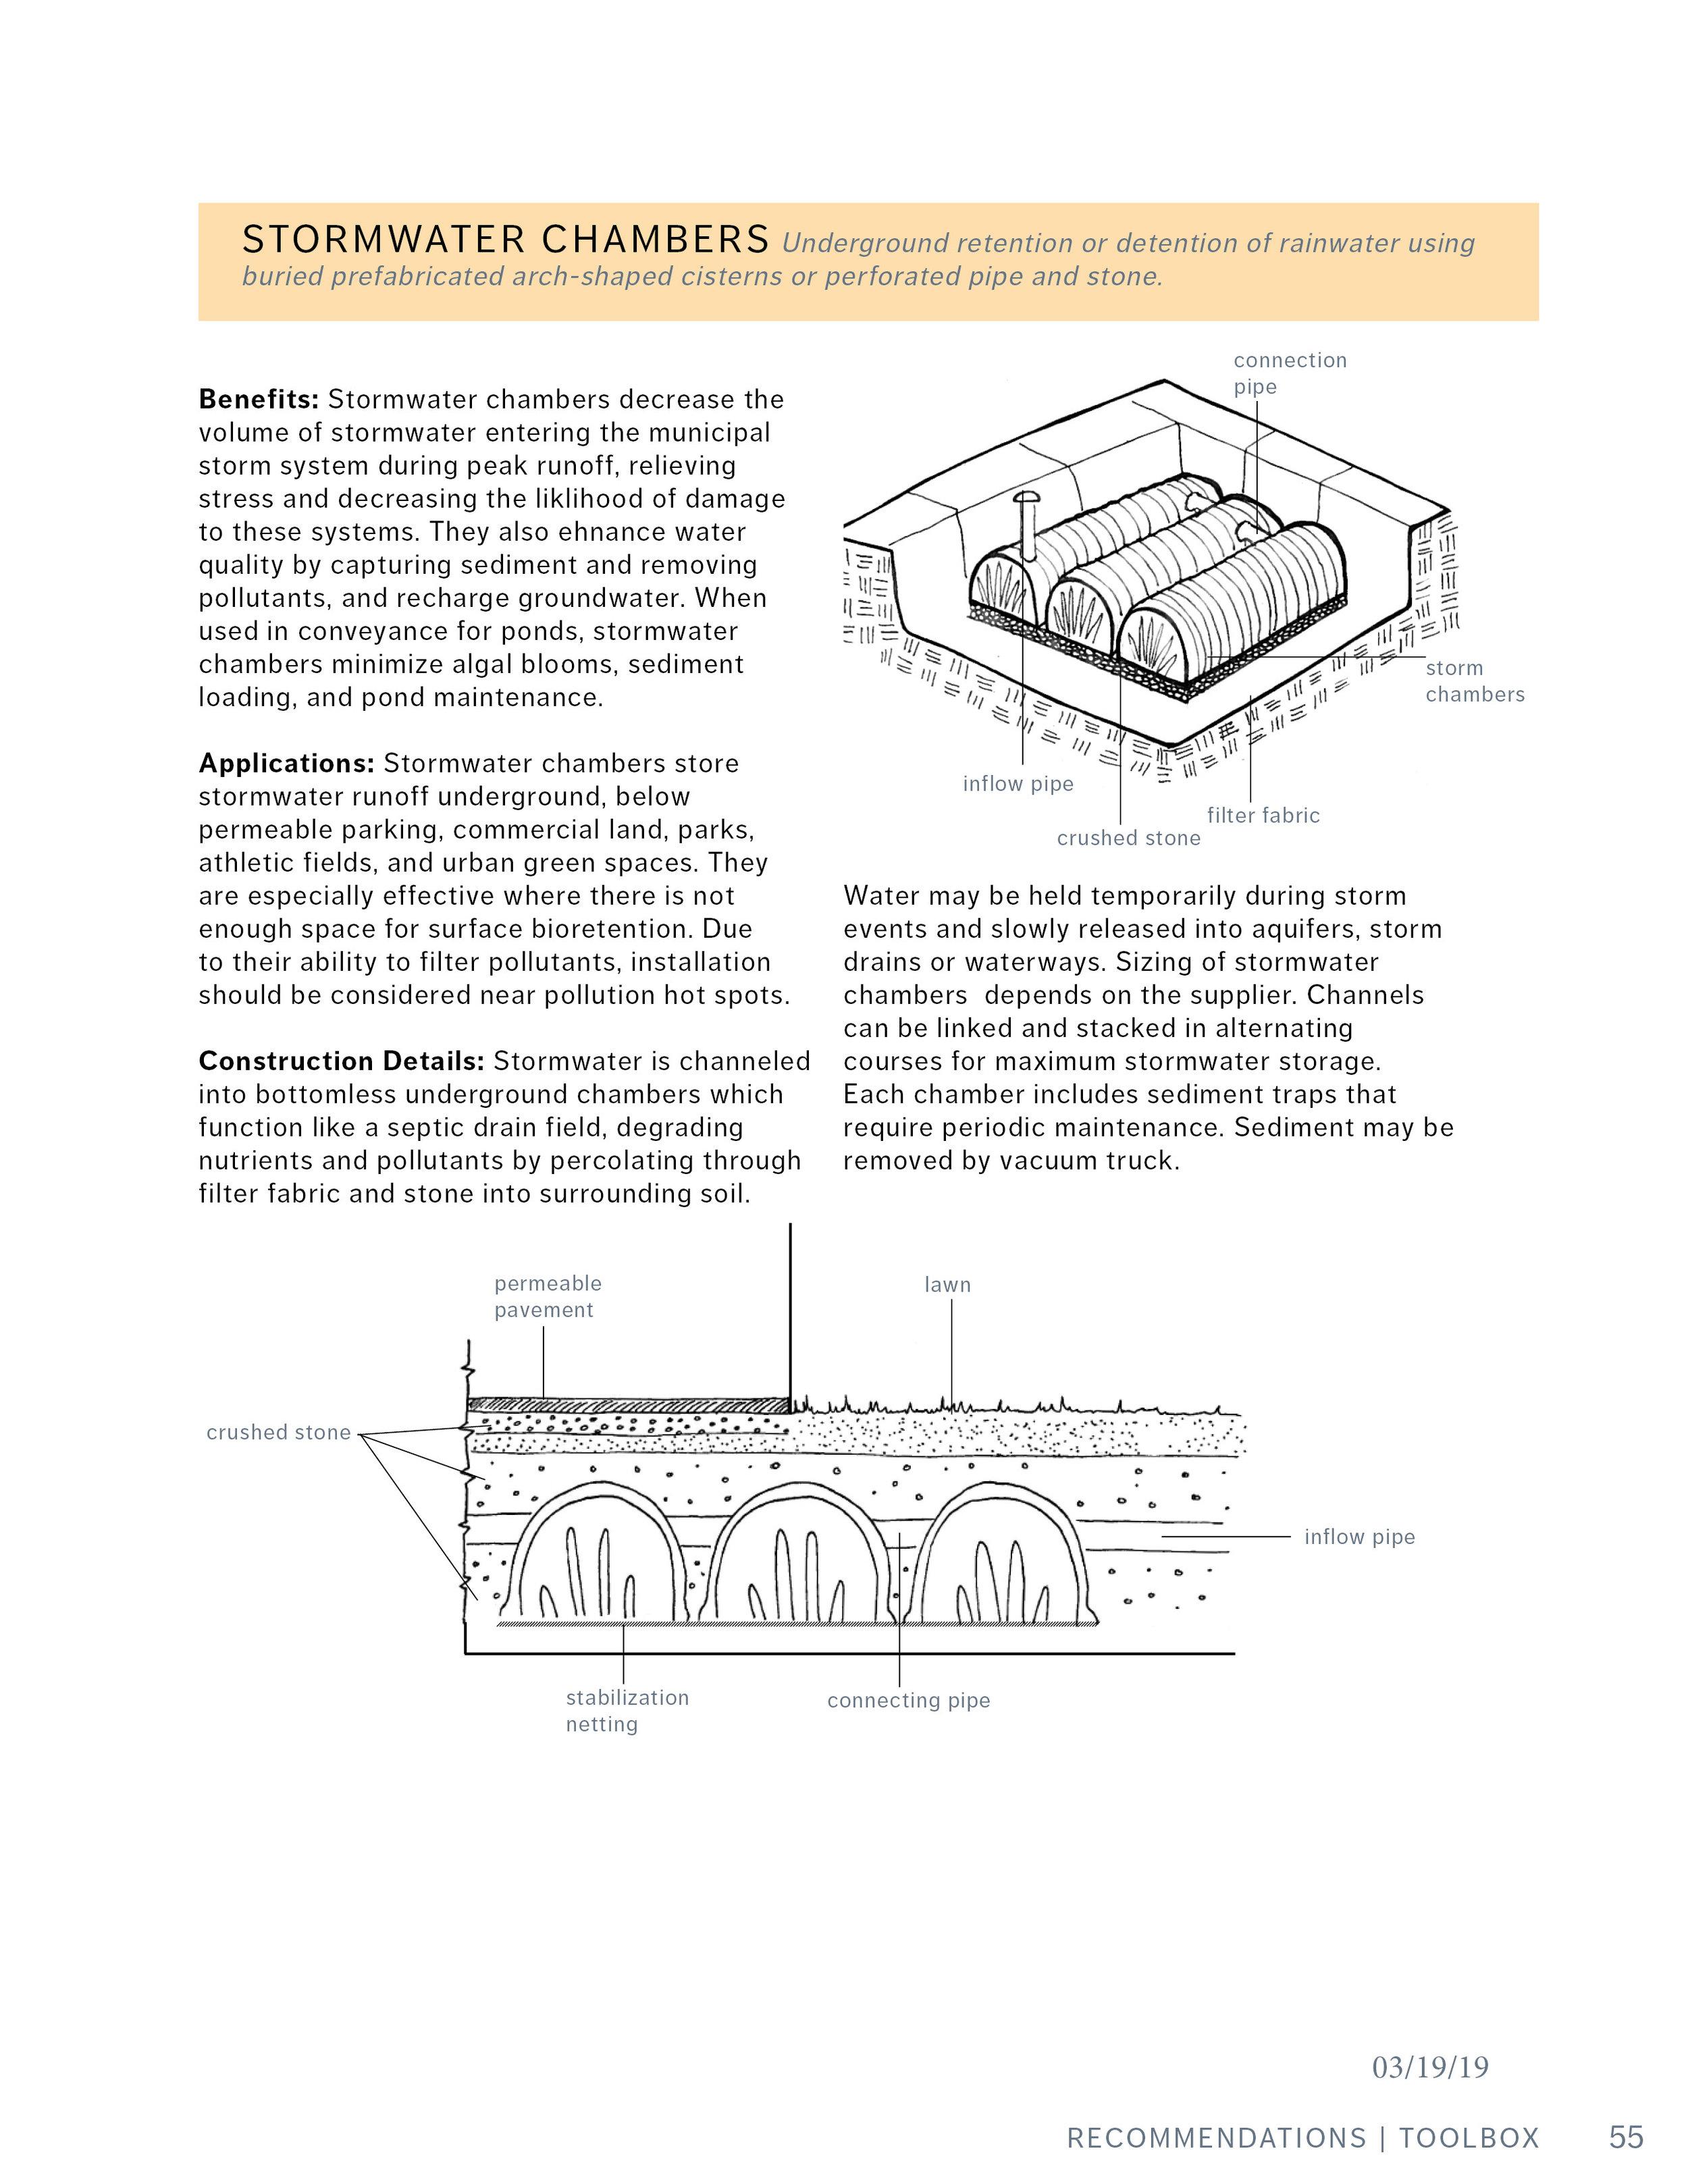 toolbox10.jpg